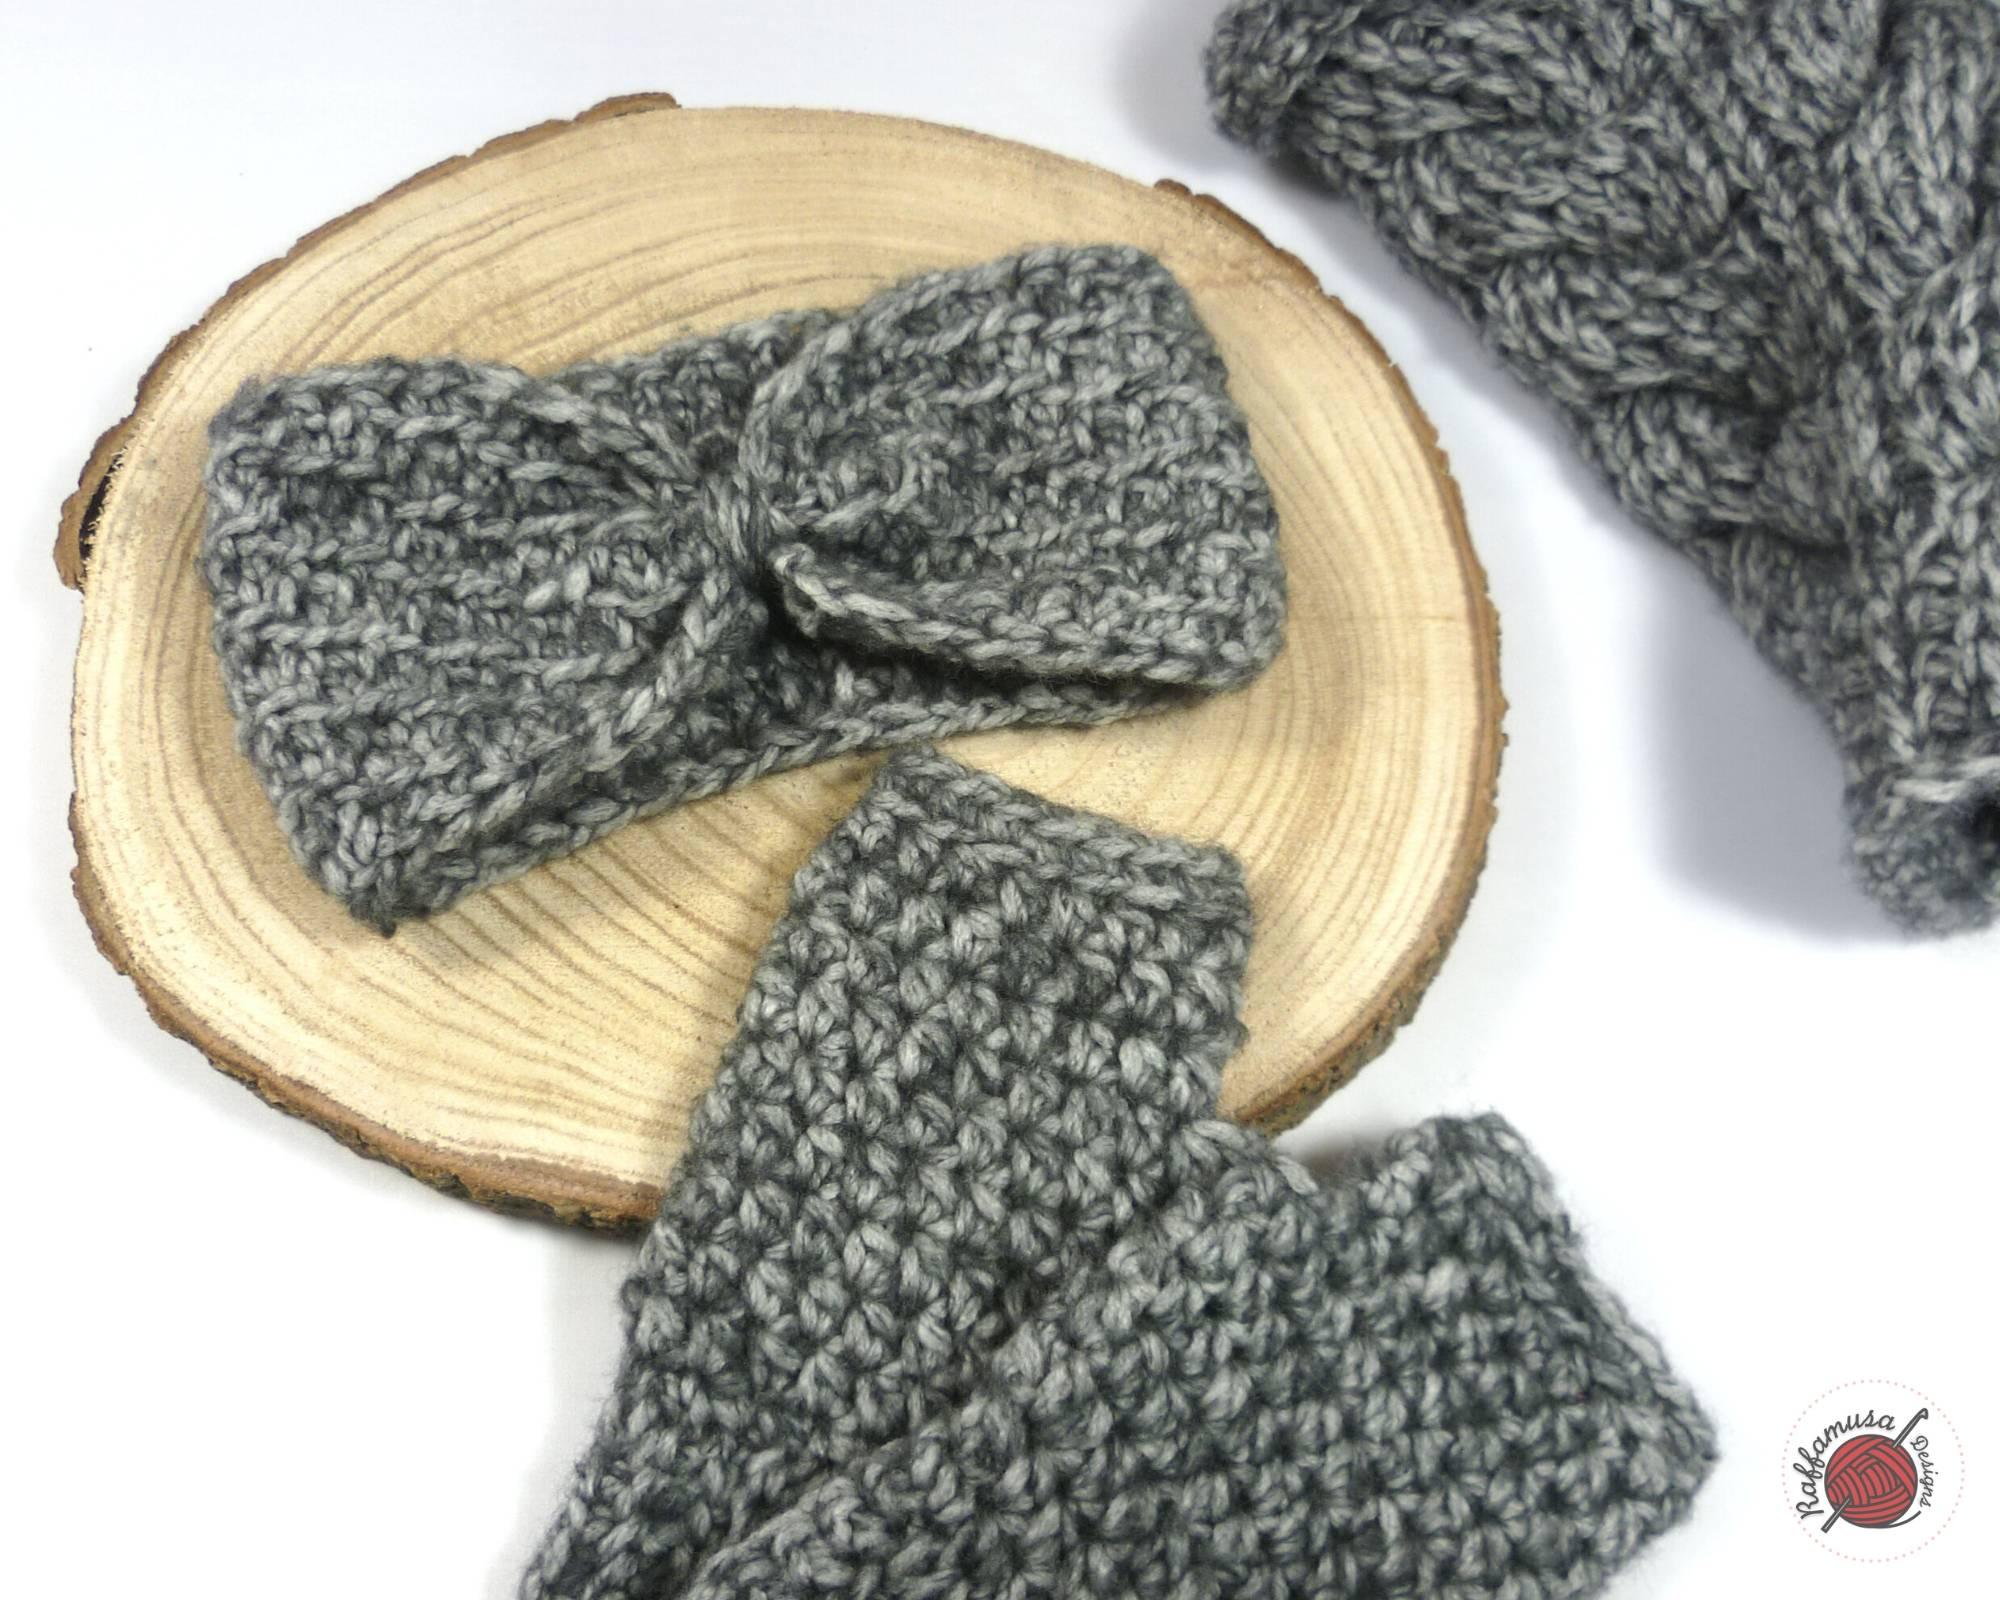 Tunisian Crochet Concept Headband - Free Pattern by RaffamusaDesigns